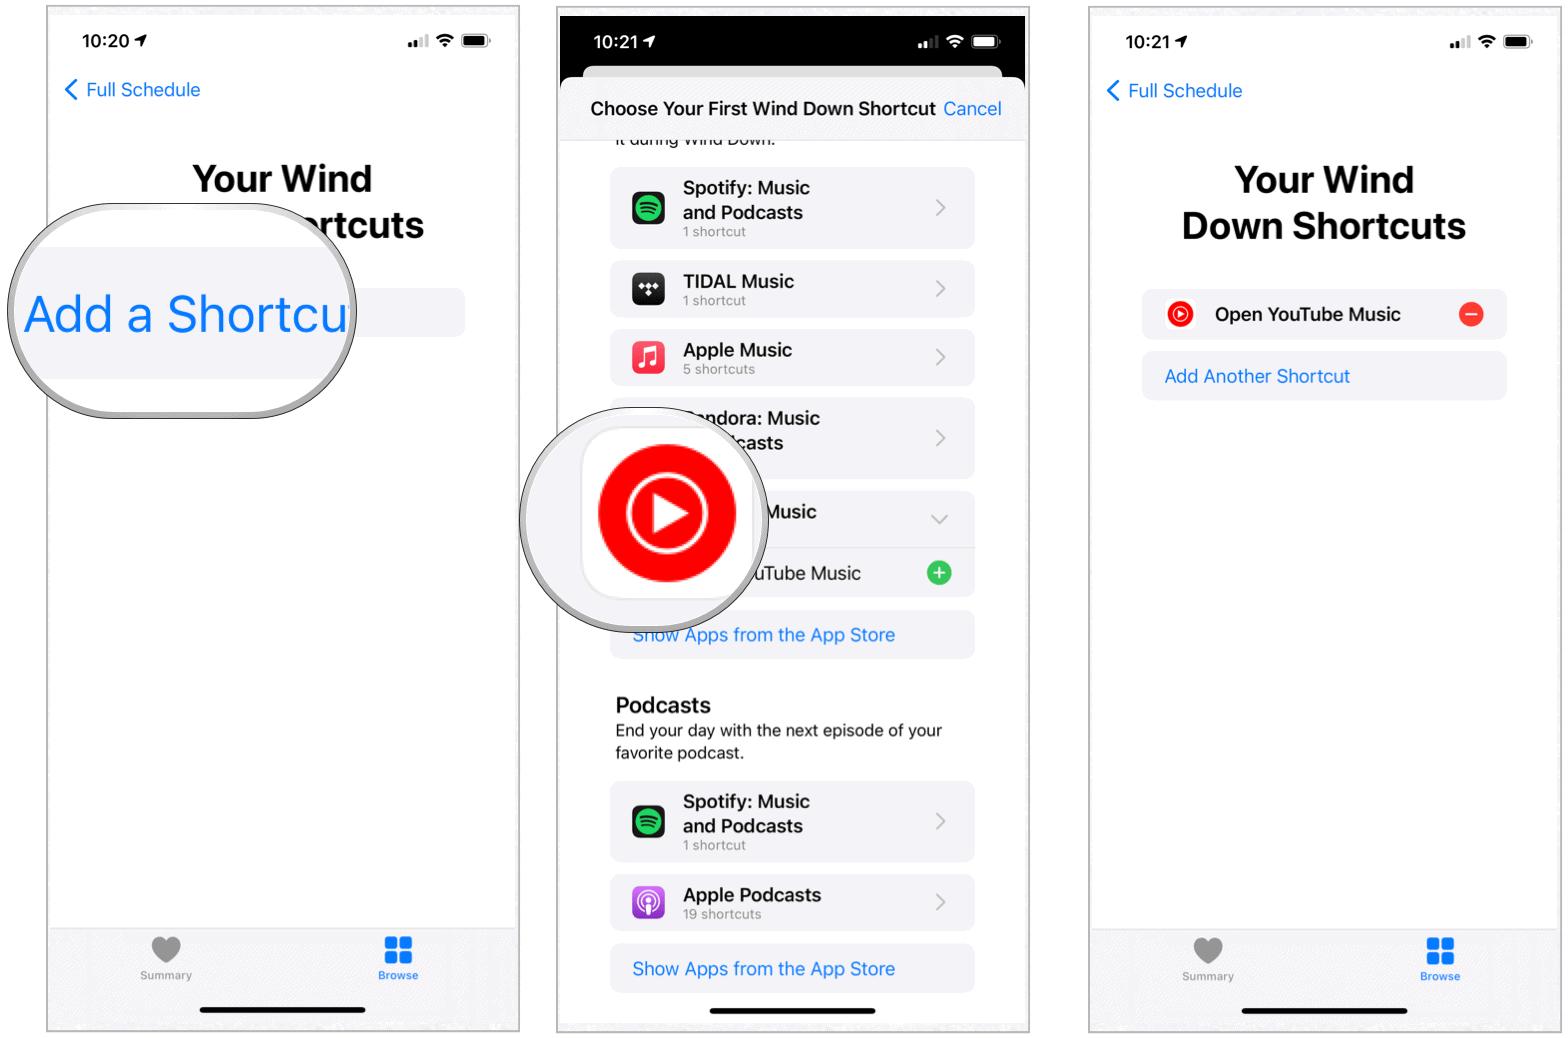 iPhone wind down shortcuts